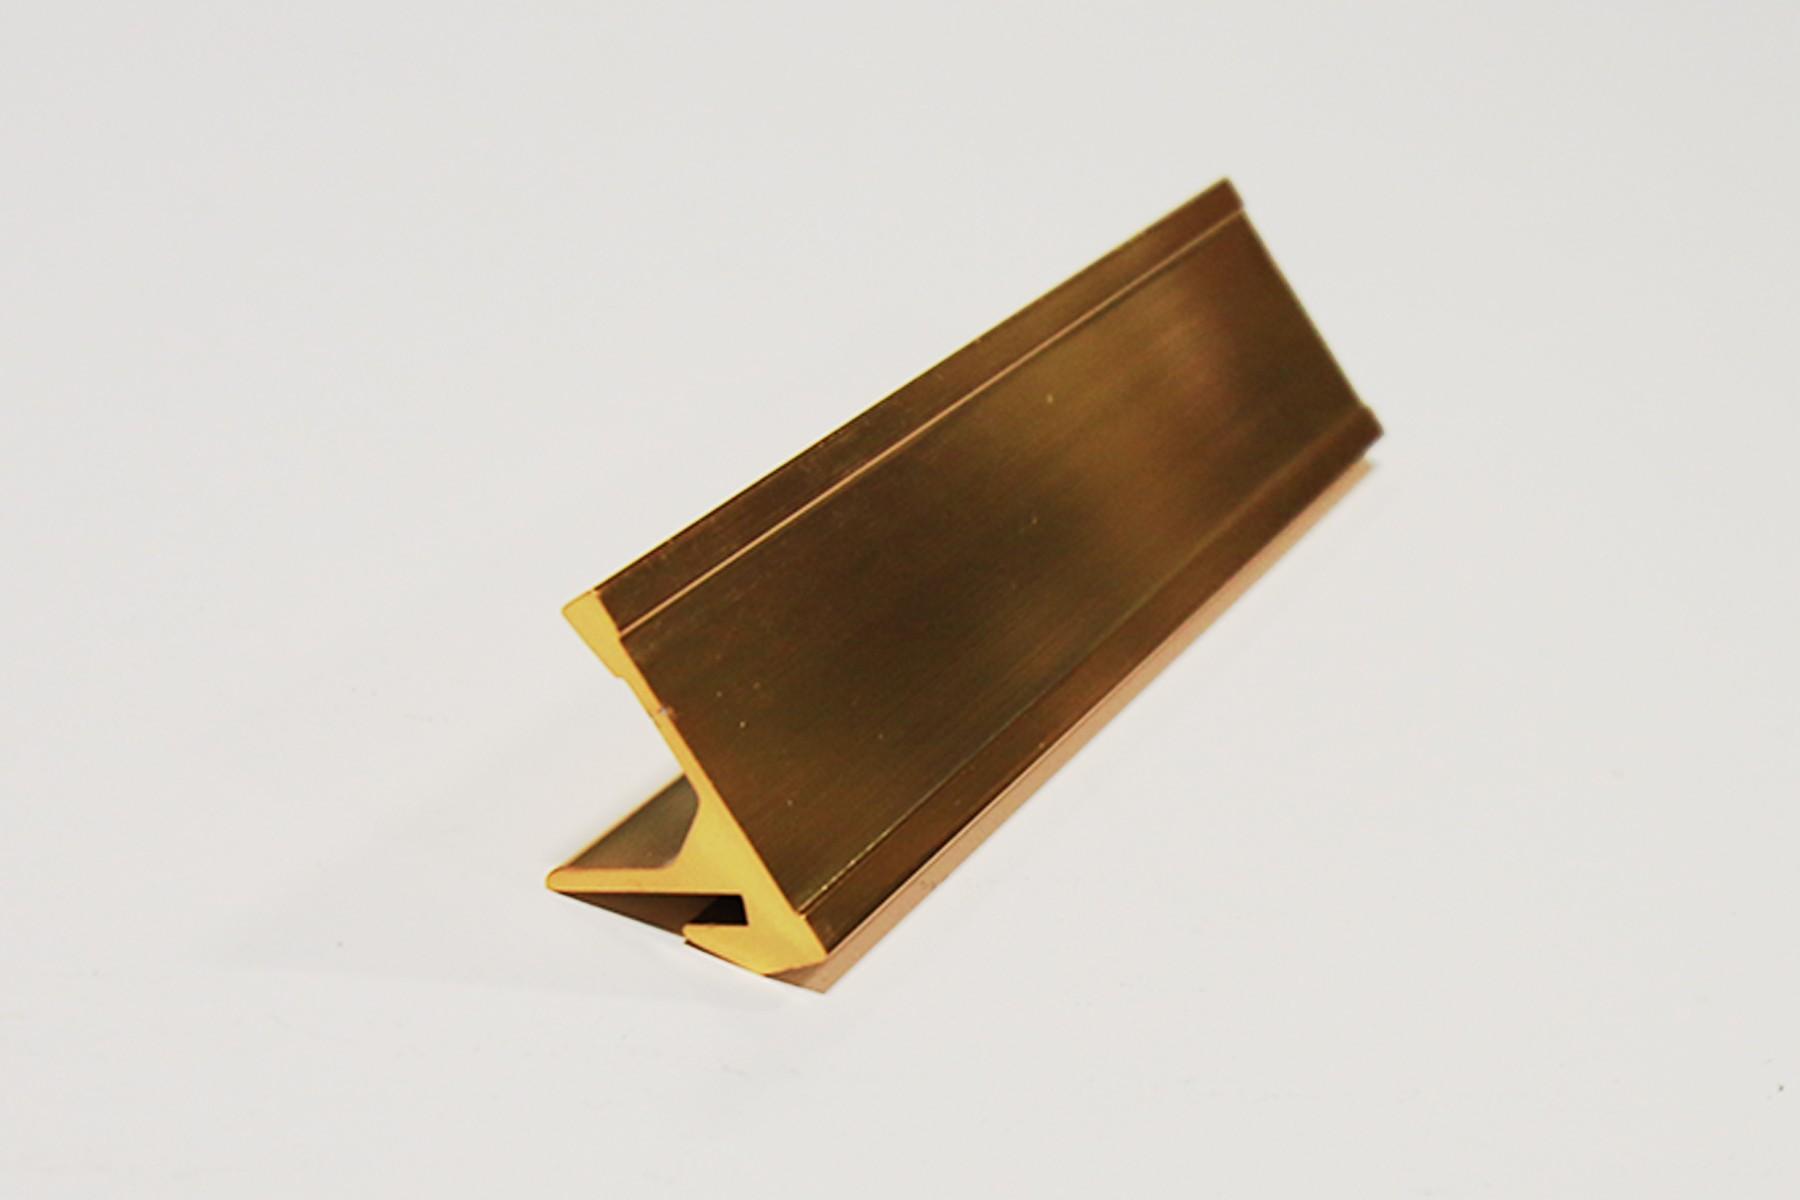 15/16 x 8 Desk Base, Gold